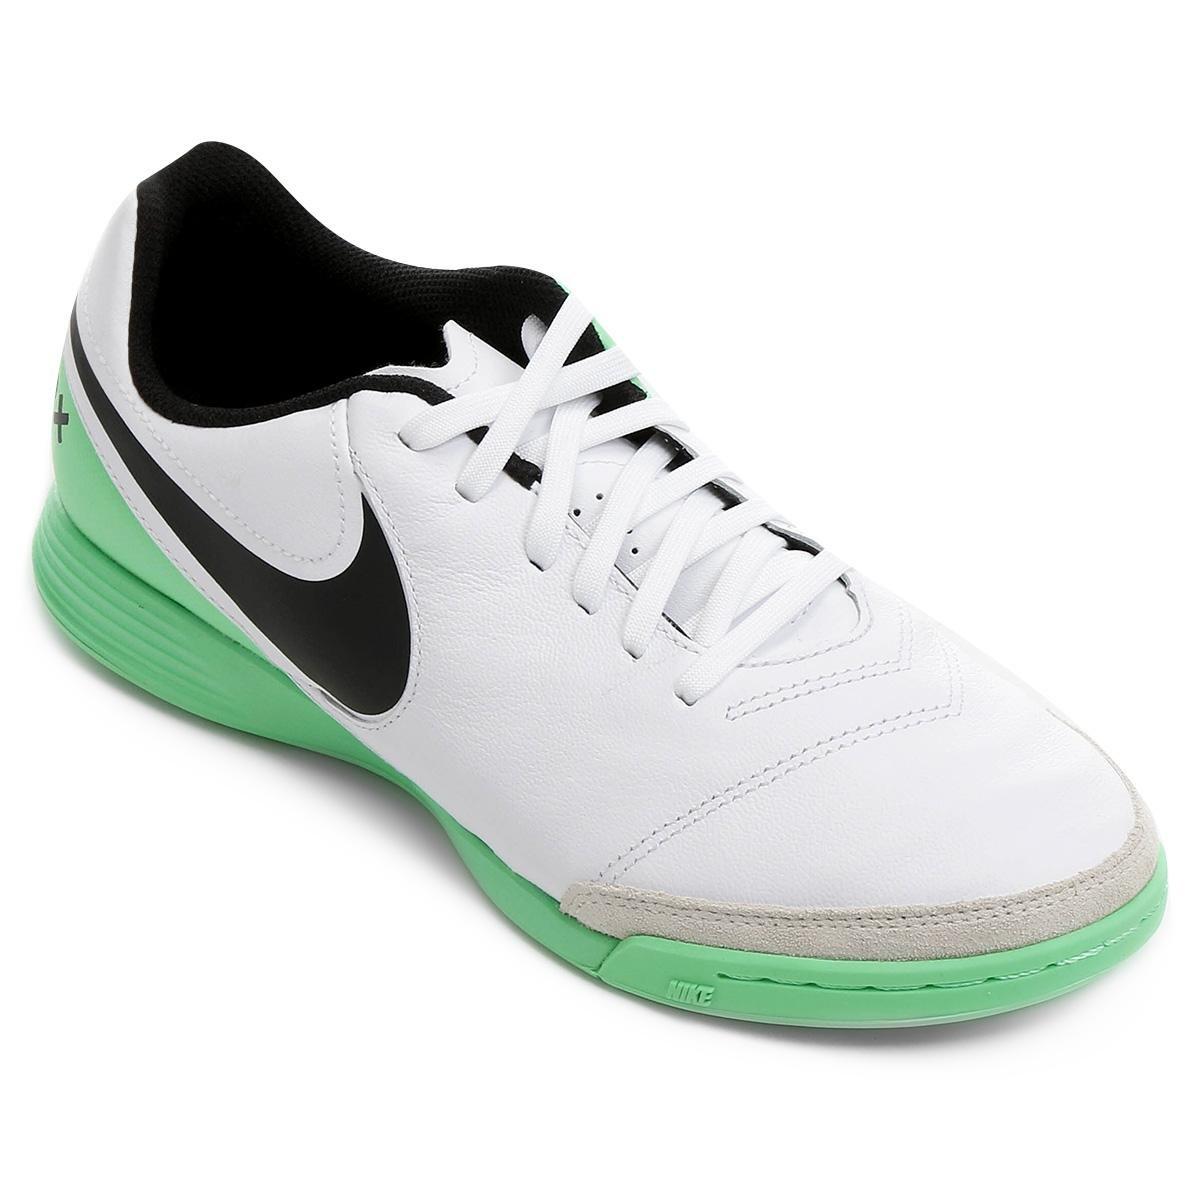 eb4404a906 Chuteira Futsal Nike Tiempo Genio 2 Leather IC - Compre Agora